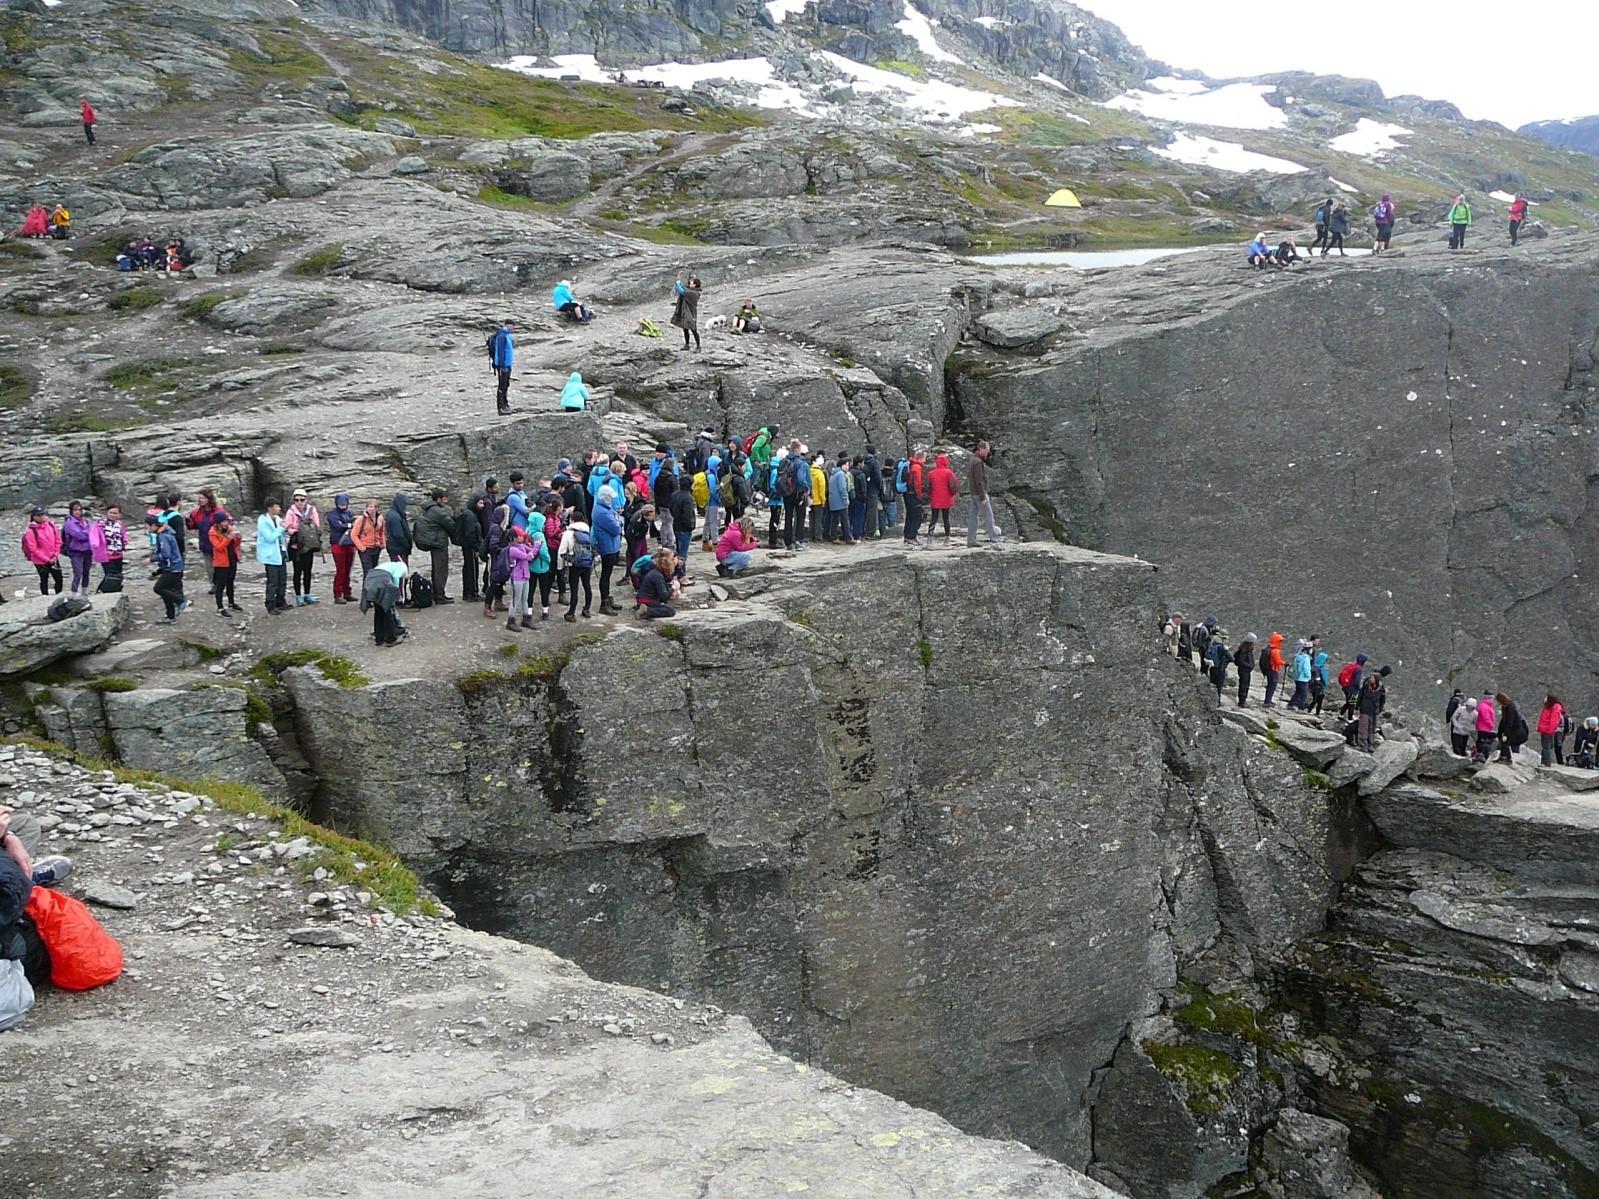 Norsko: levná pouť drahou zemí